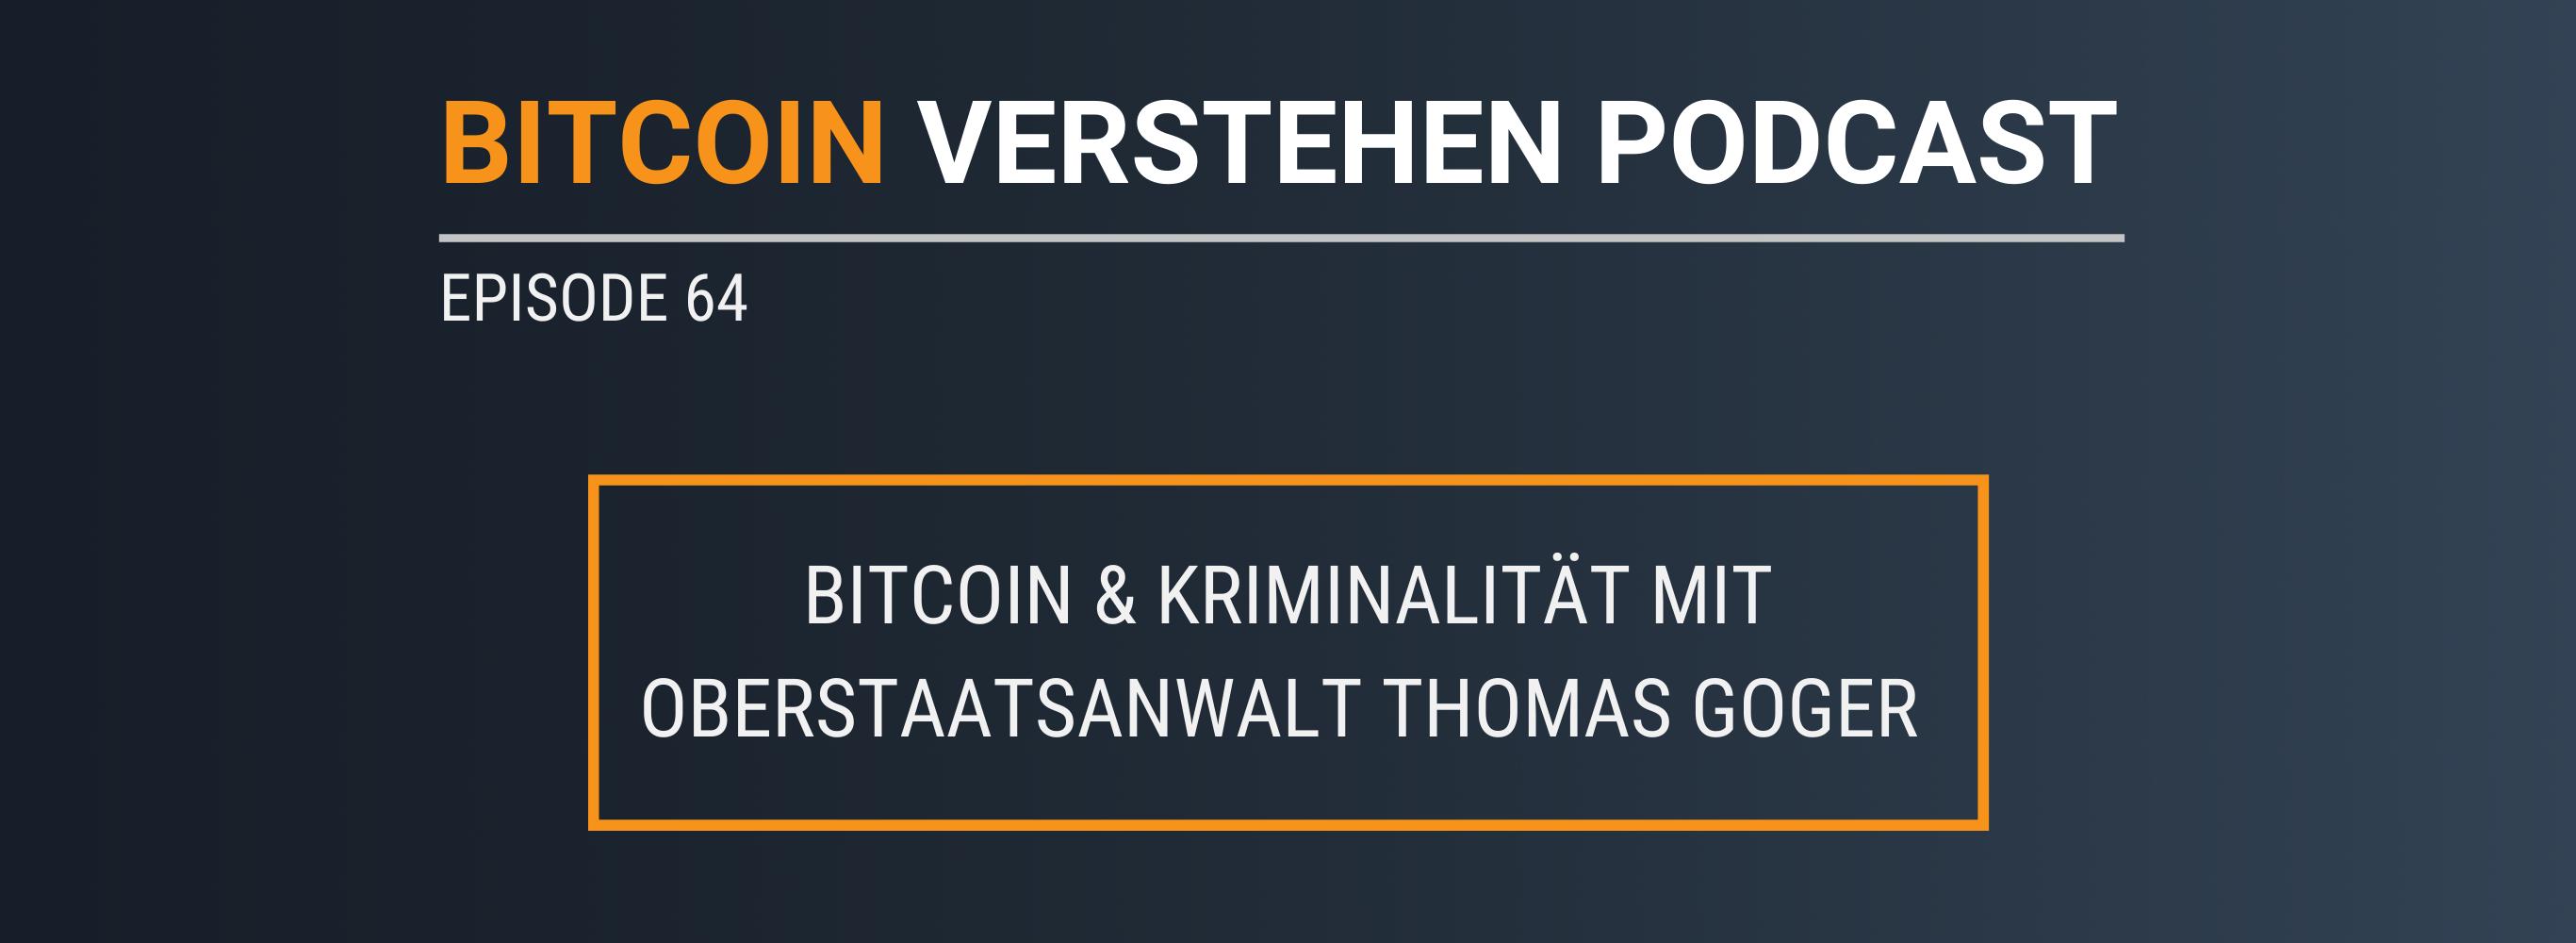 Episode 64 – Bitcoin & Kriminalität mit Oberstaatsanwalt Thomas Goger